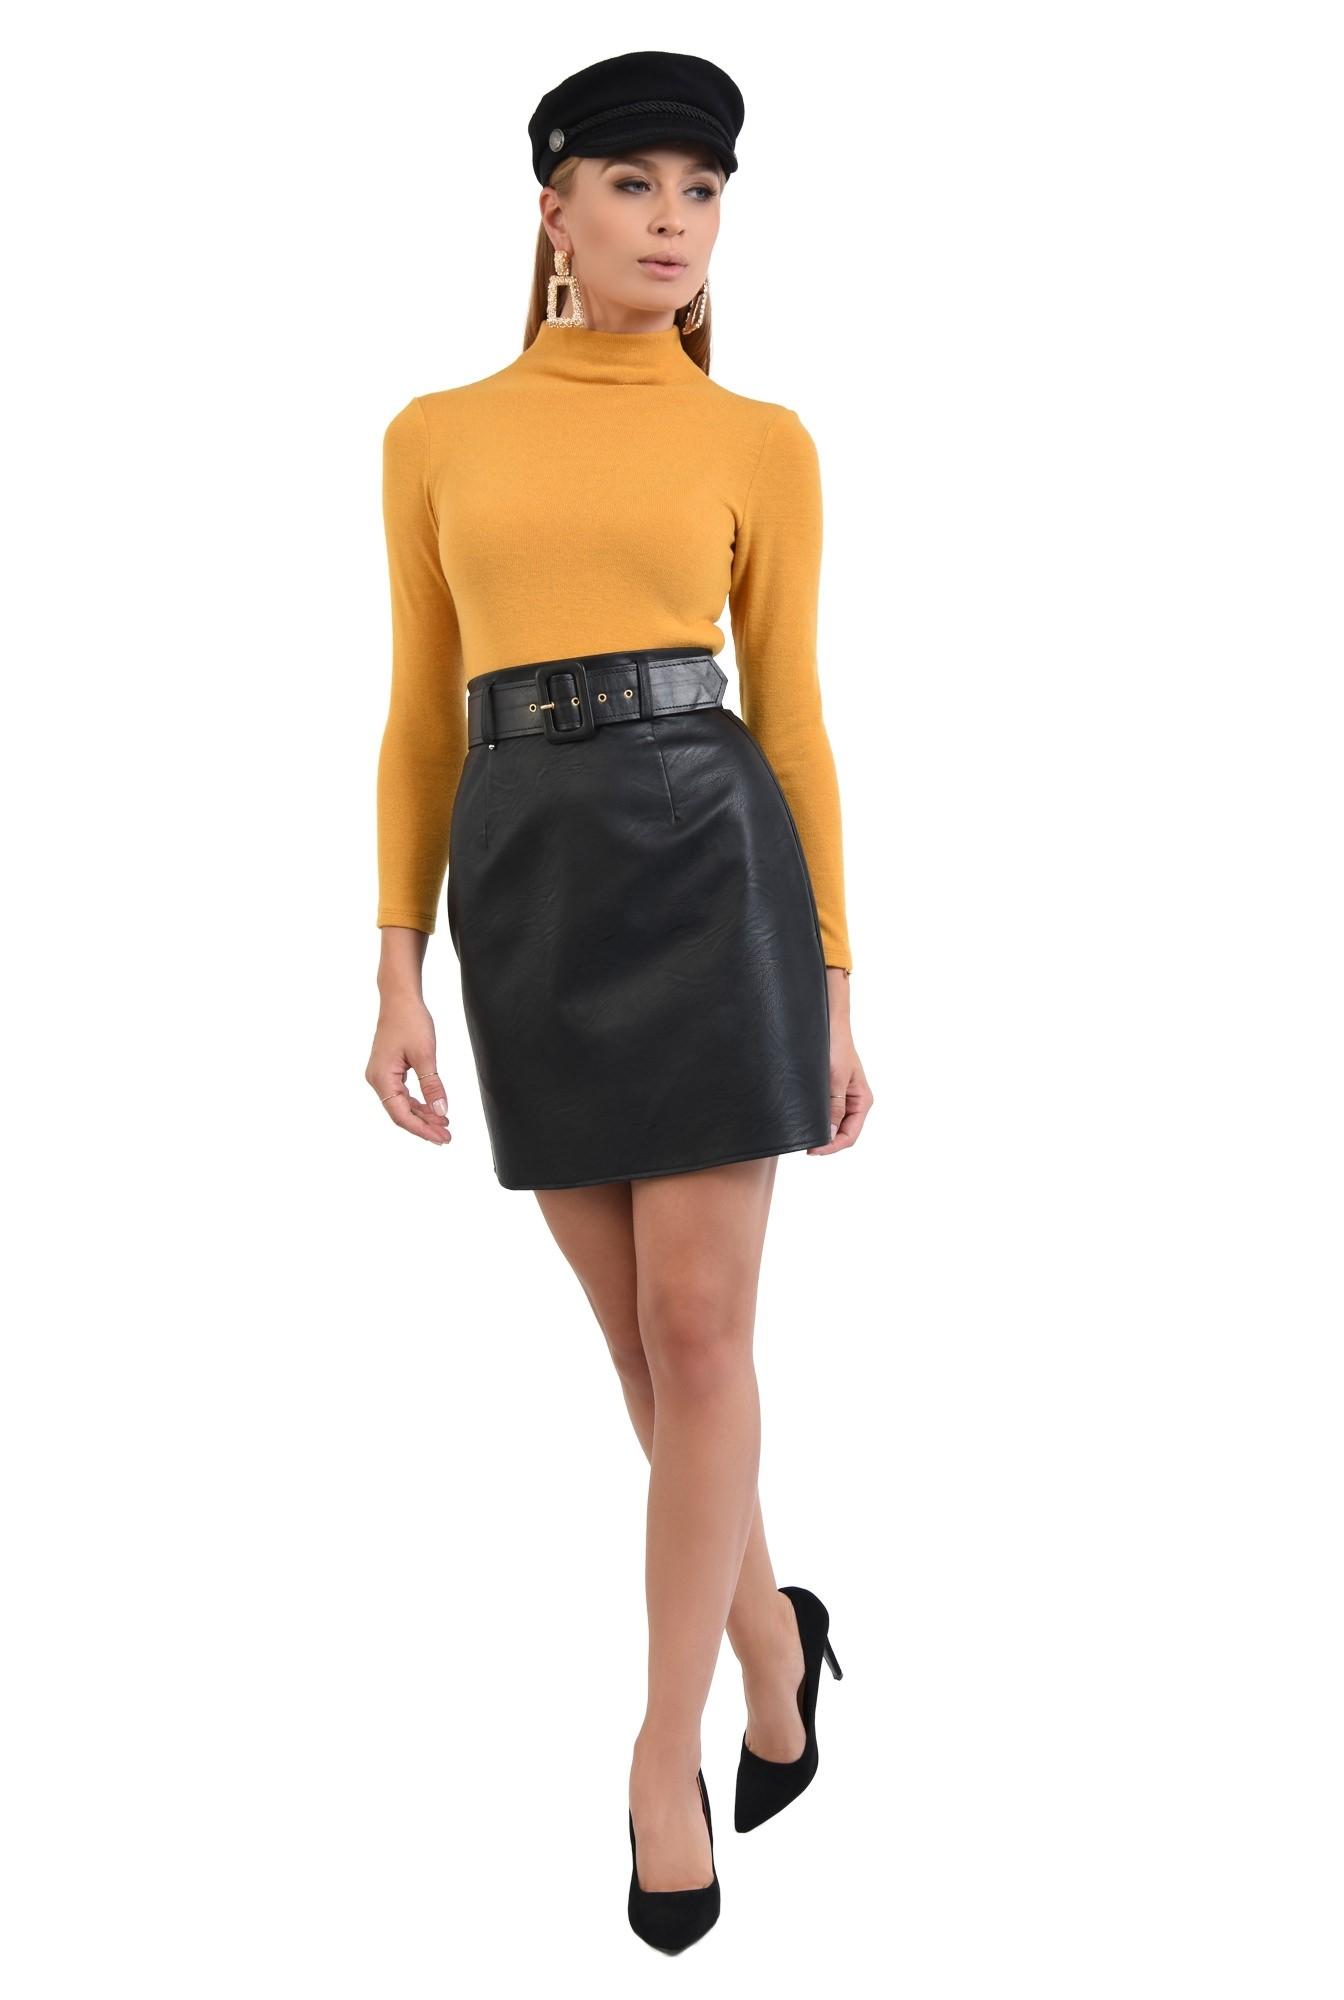 360 - helanca mustar, pulover, bluze online, tricotaje